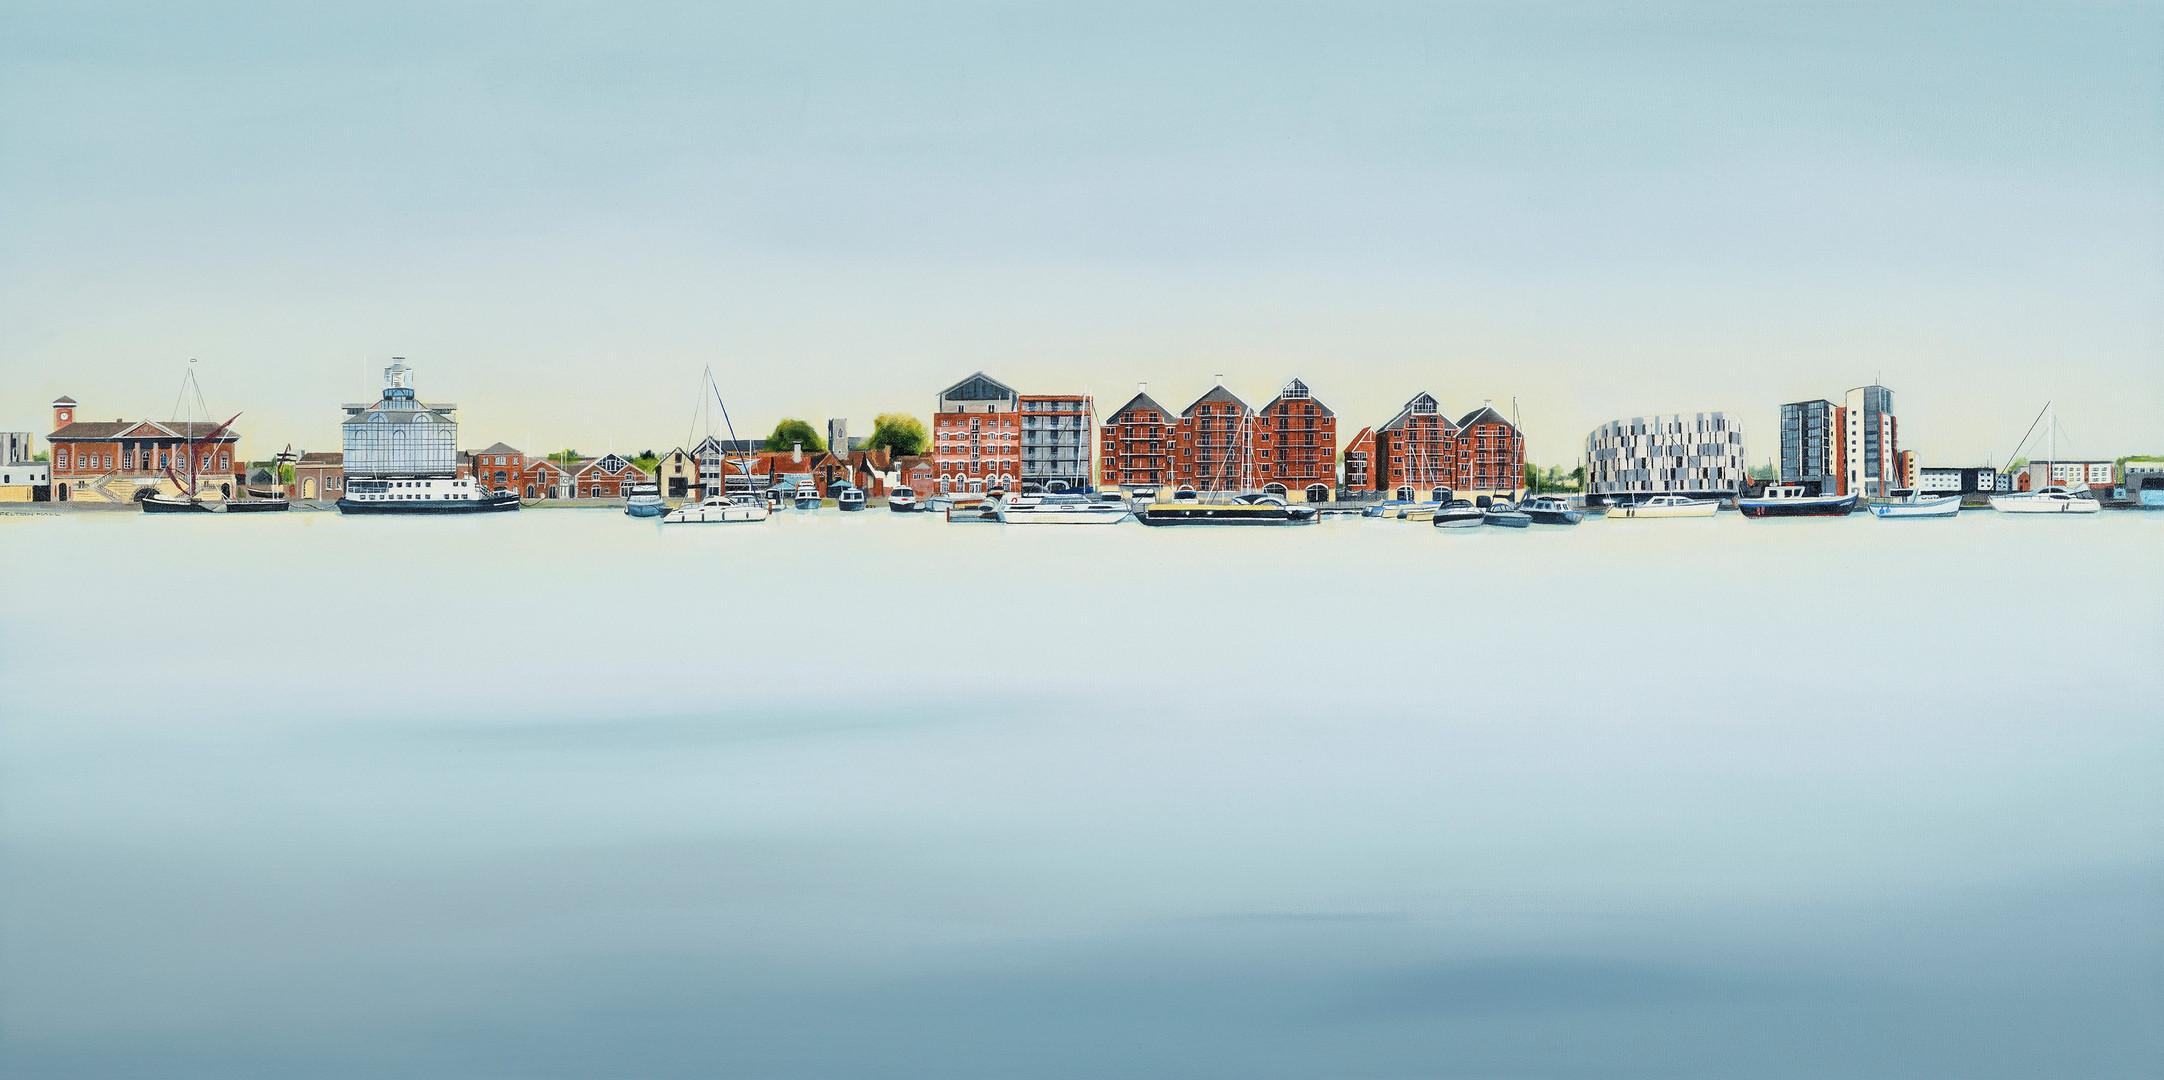 Kate Felton_Ipswich Waterfront 1_oil on